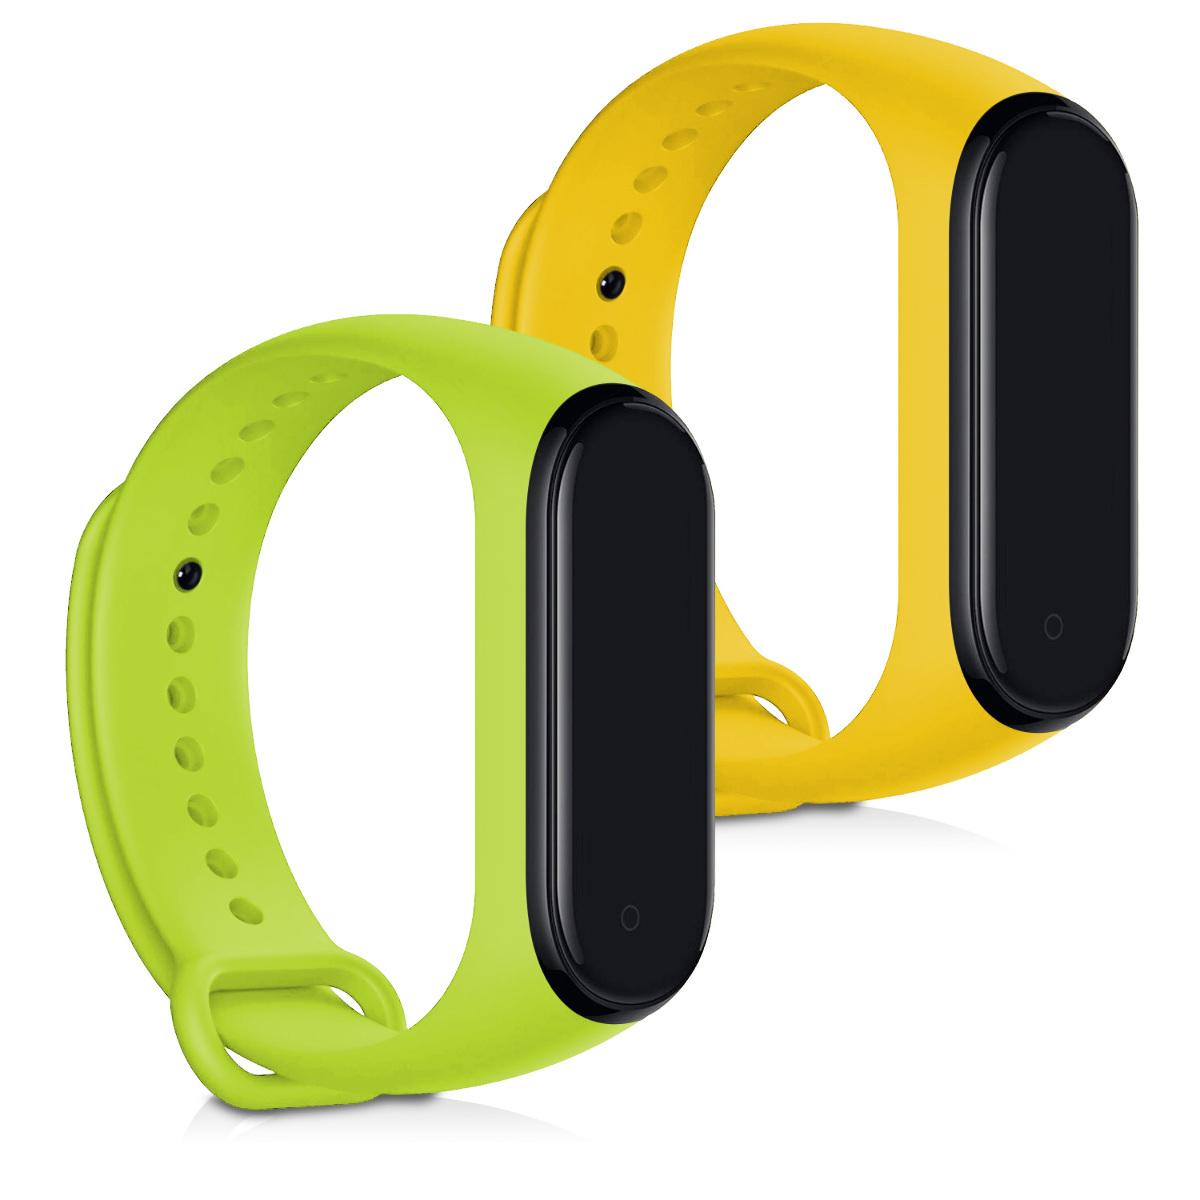 KW Ανταλλακτικά Αδιάβροχα Λουράκια Xiaomi Mi Band 4 - Yellow / Green - 2 τεμάχια (49312.08)